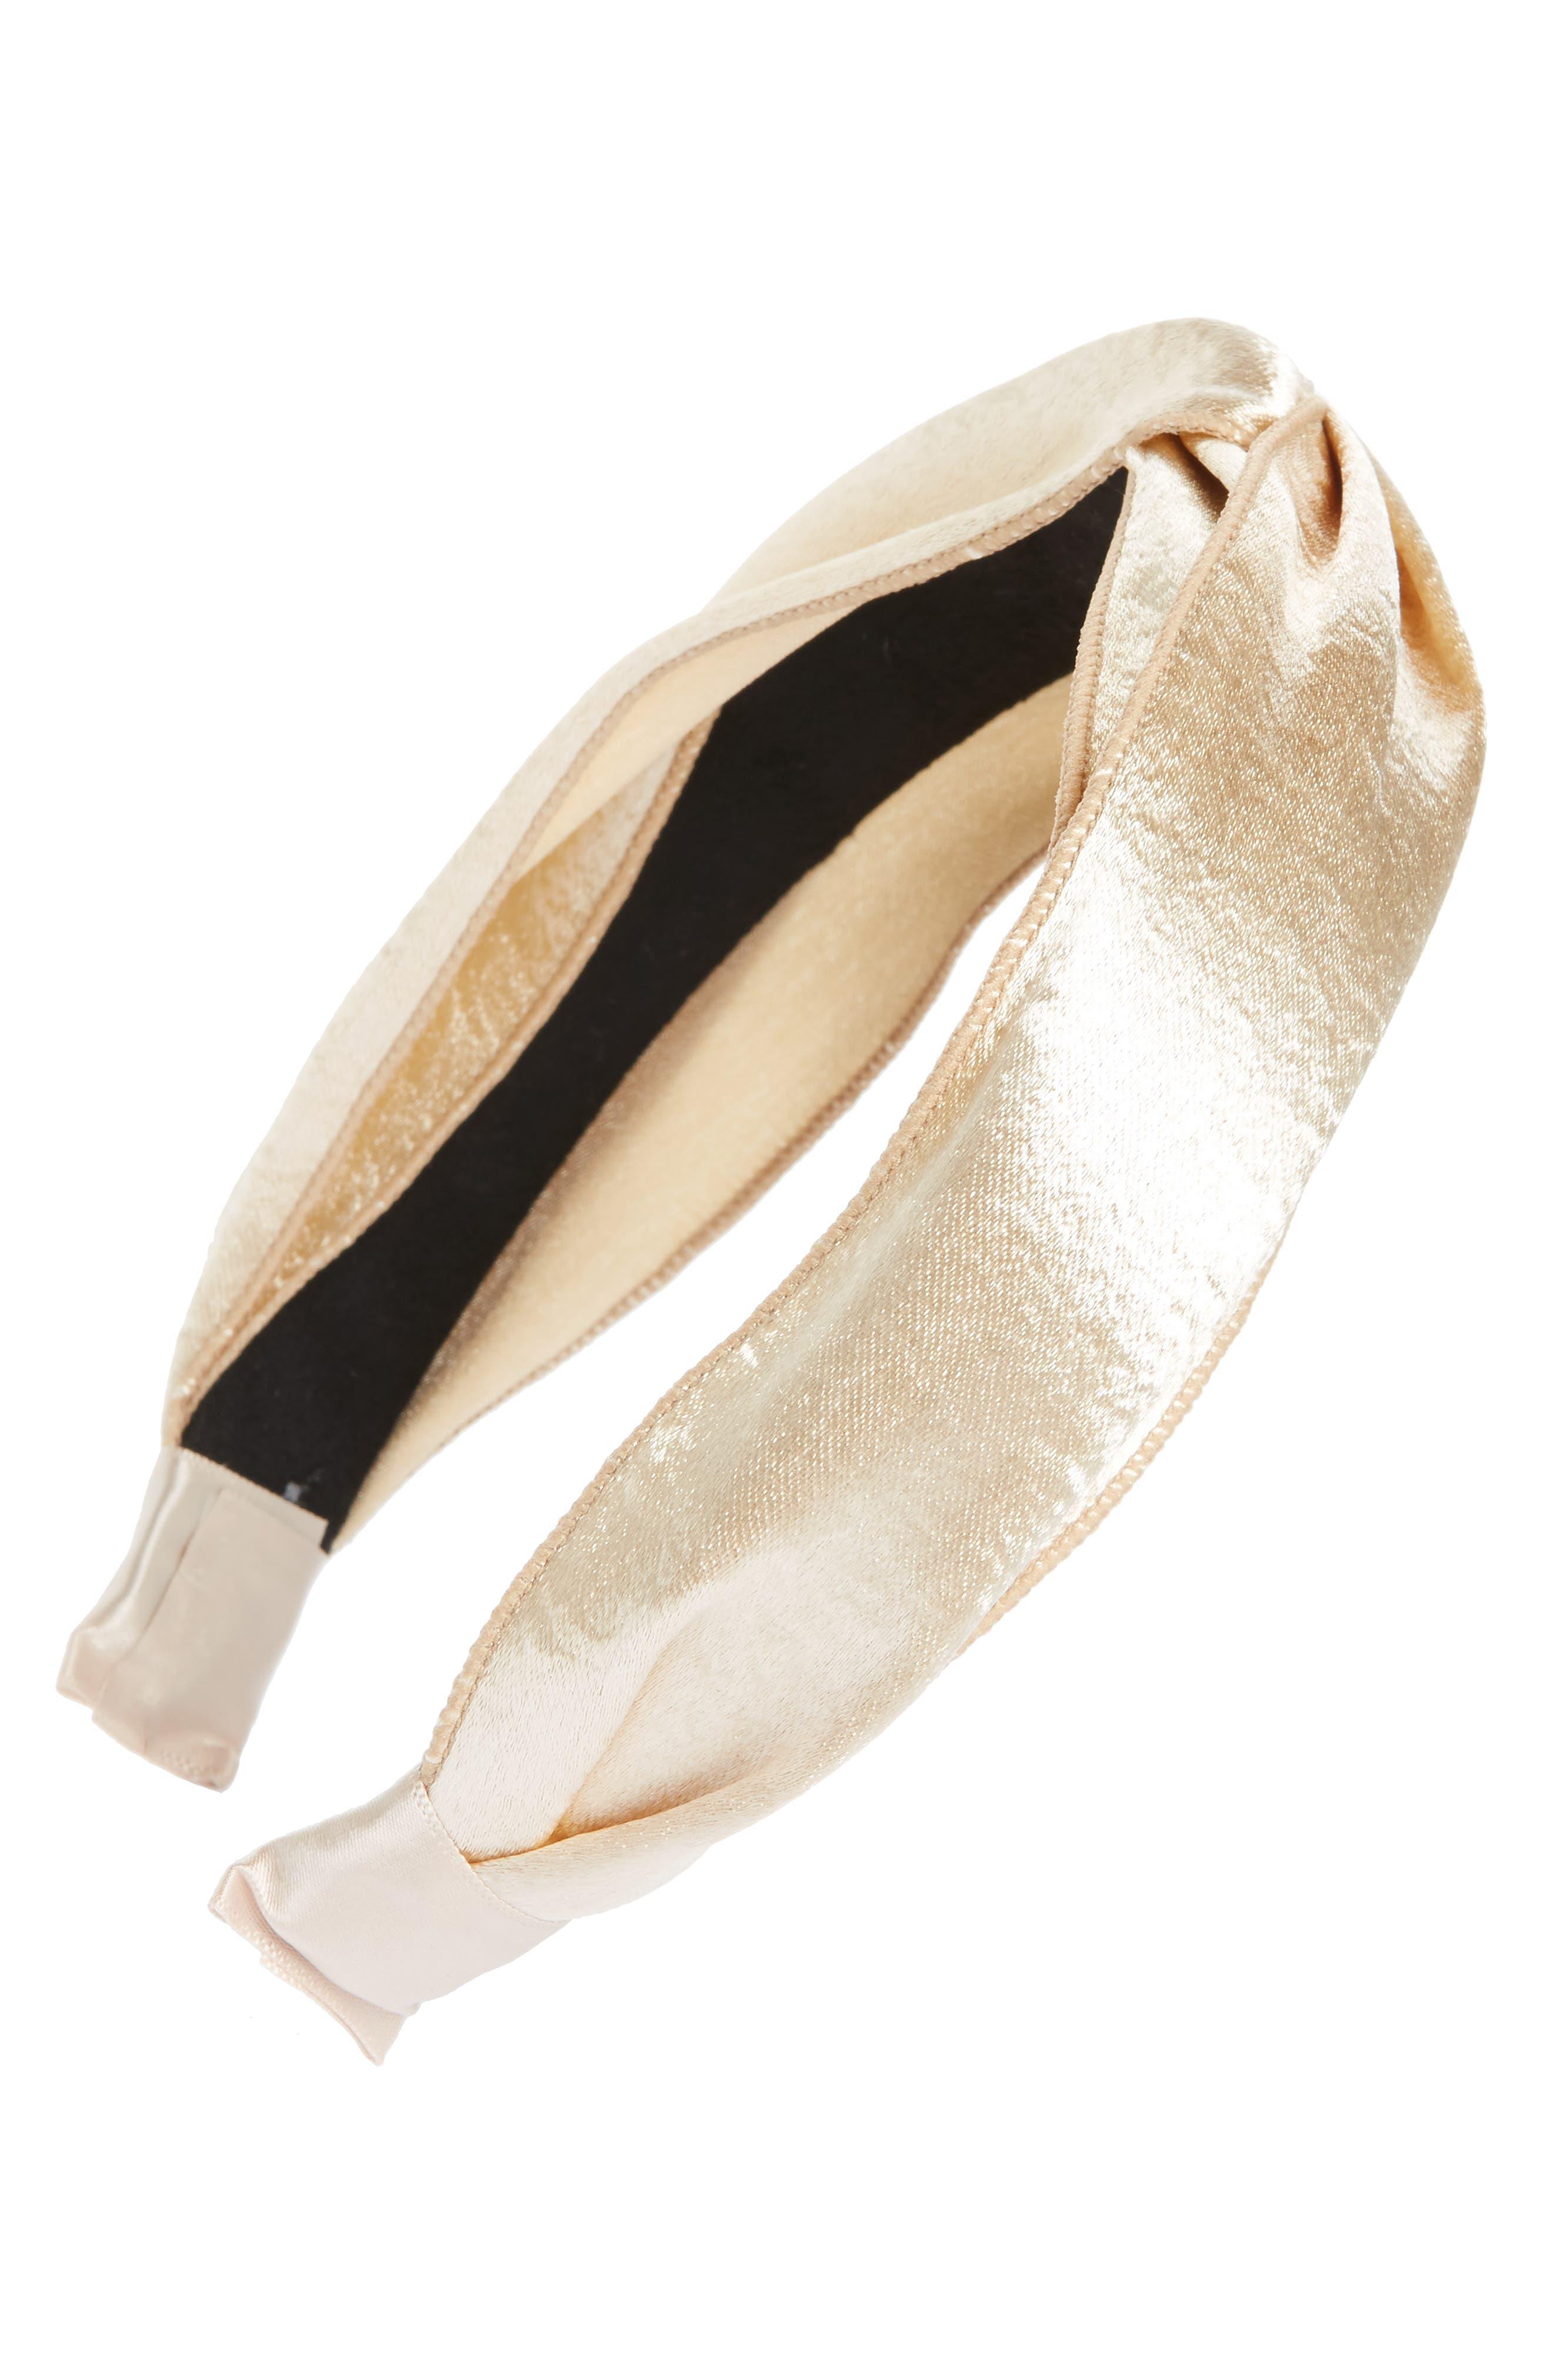 Main Image - Cara Metallic Twist Knot Headband